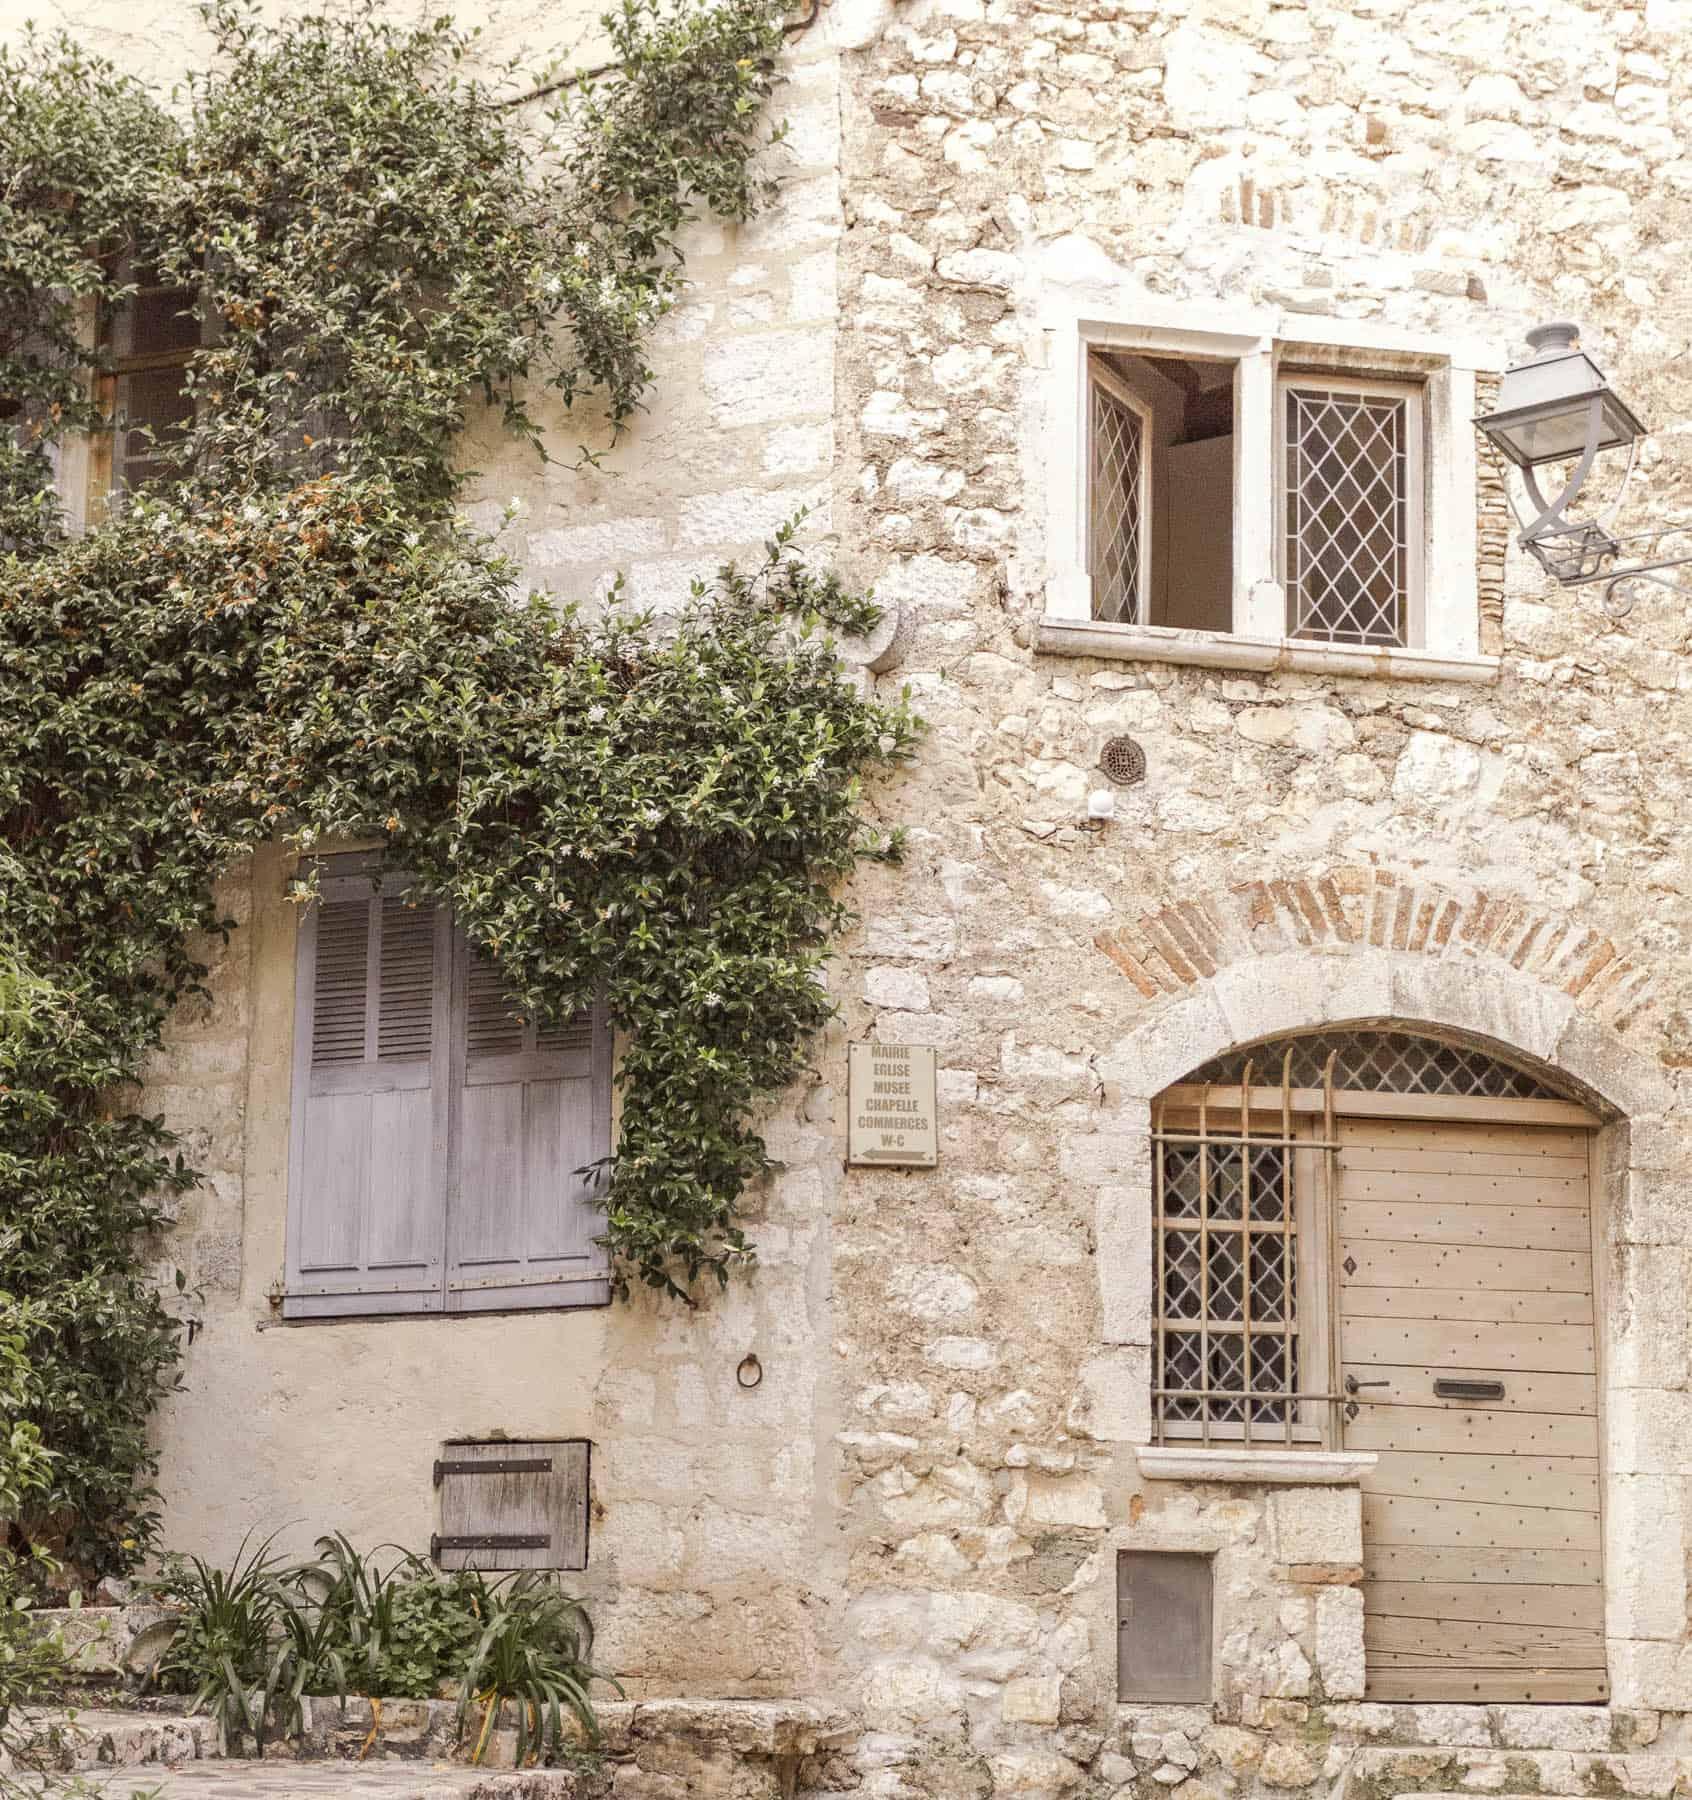 15 Photos That Will Make You Want To Visit Saint Paul de Vence